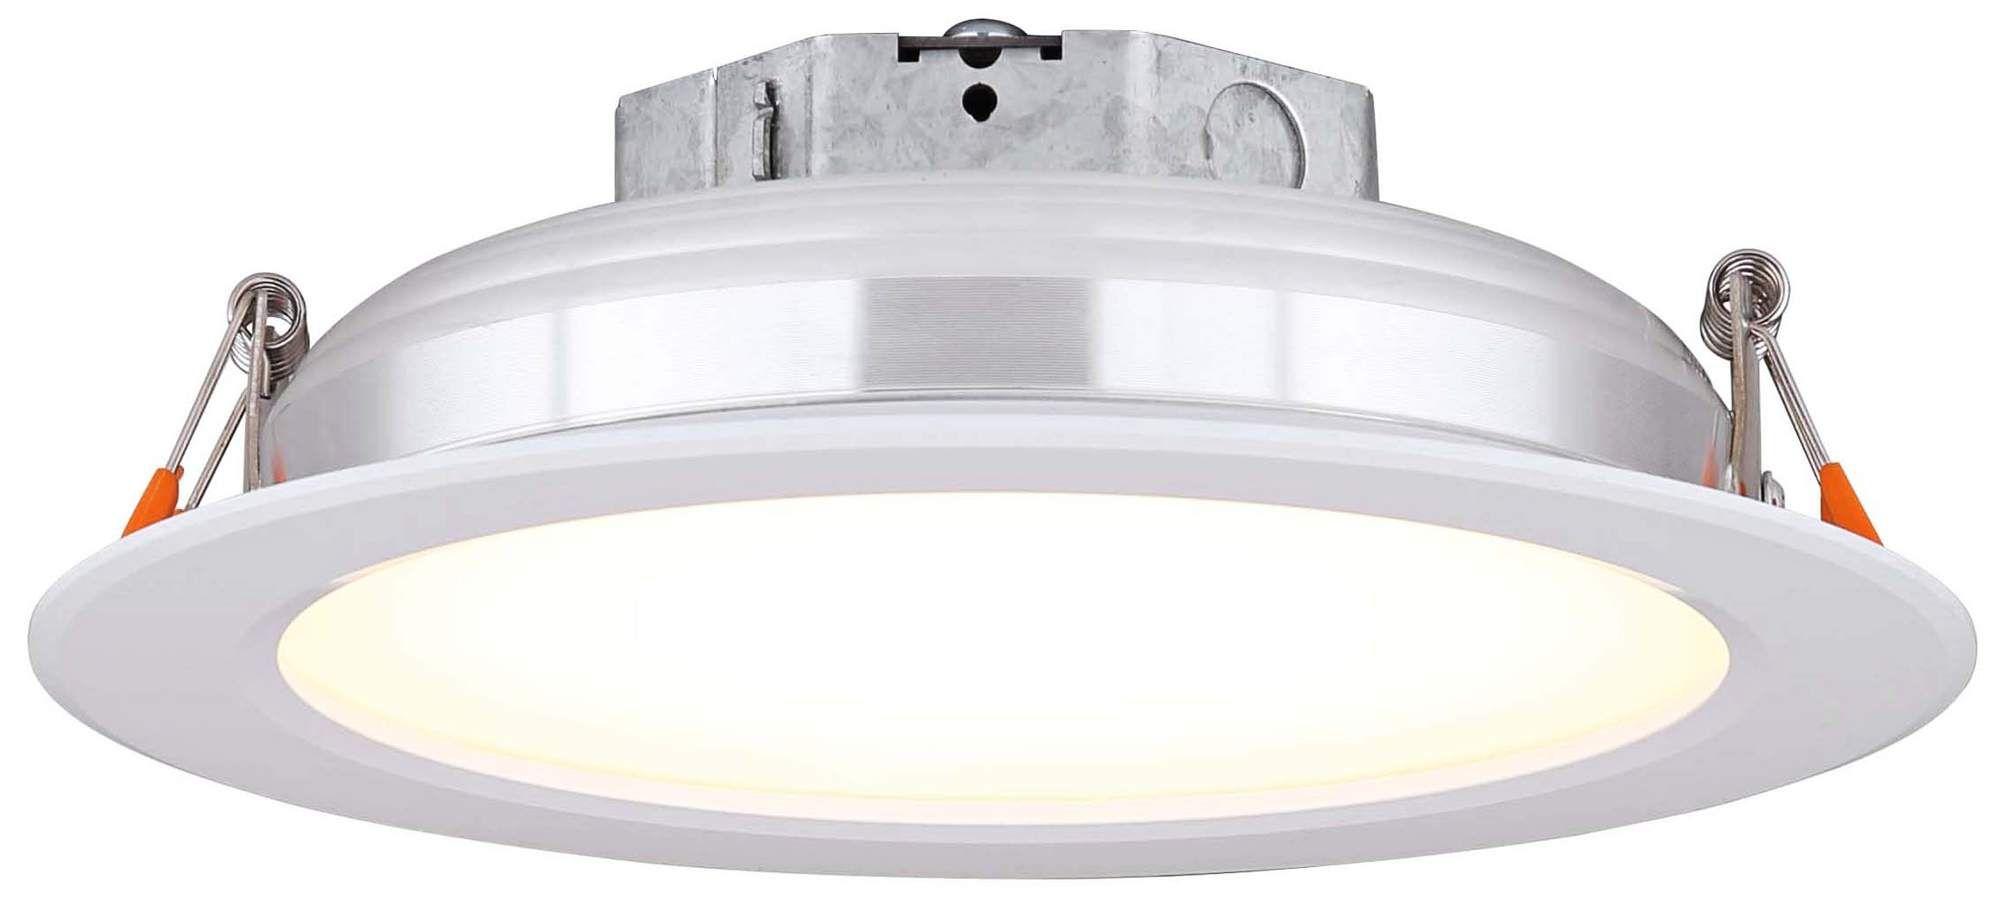 Recessed Lighting Veloce 6 White Led Retrofit Downlight Recessed Lighting White Lead Downlights